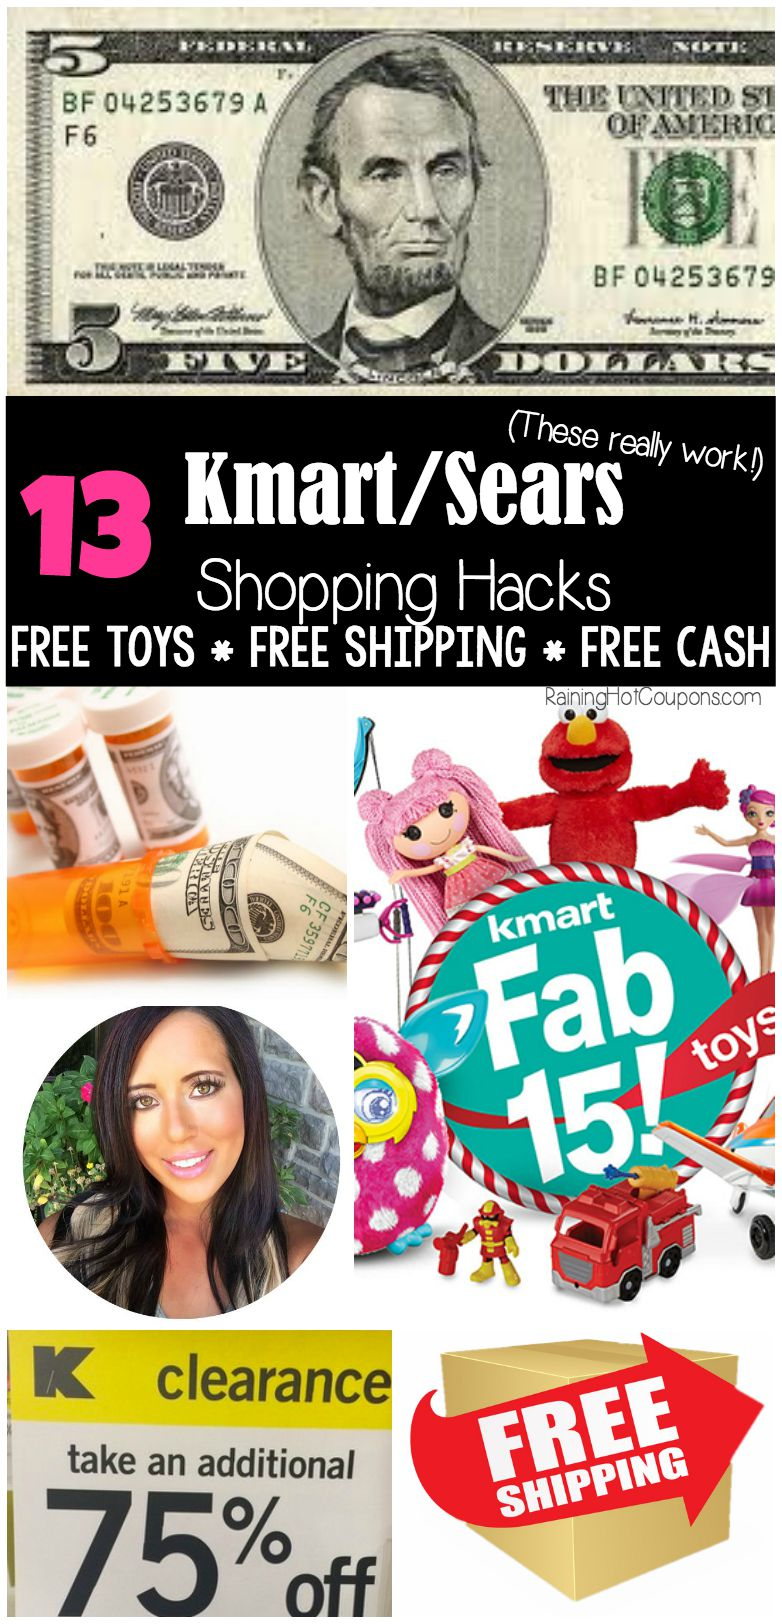 Sears free cash coupon